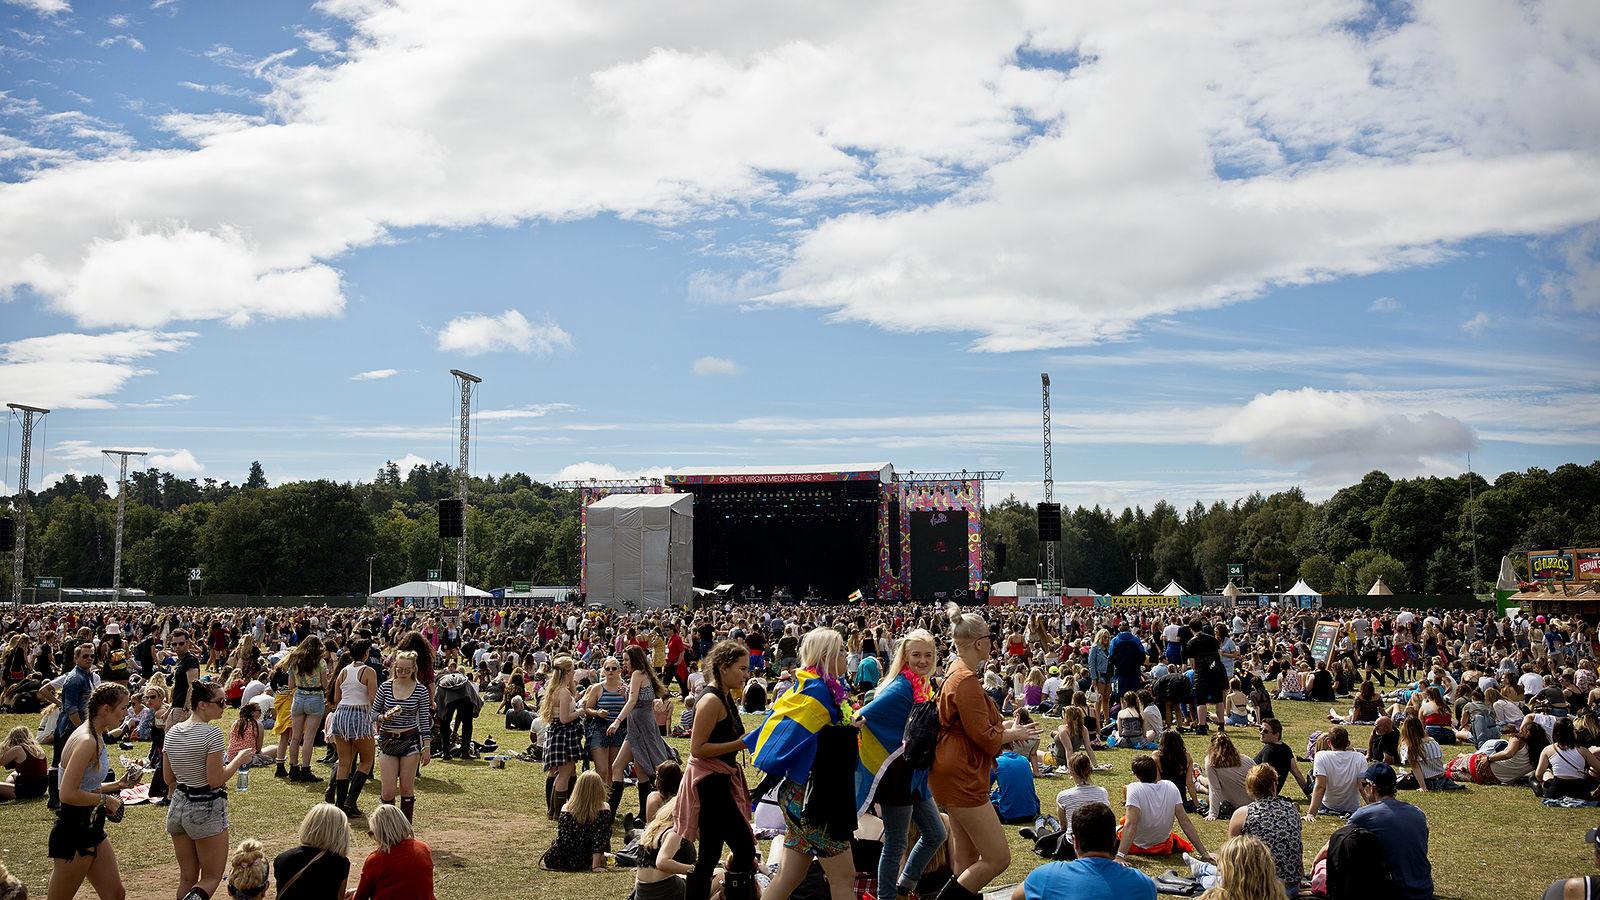 V Festival 2016 - Main Arena - Bianca Barrett